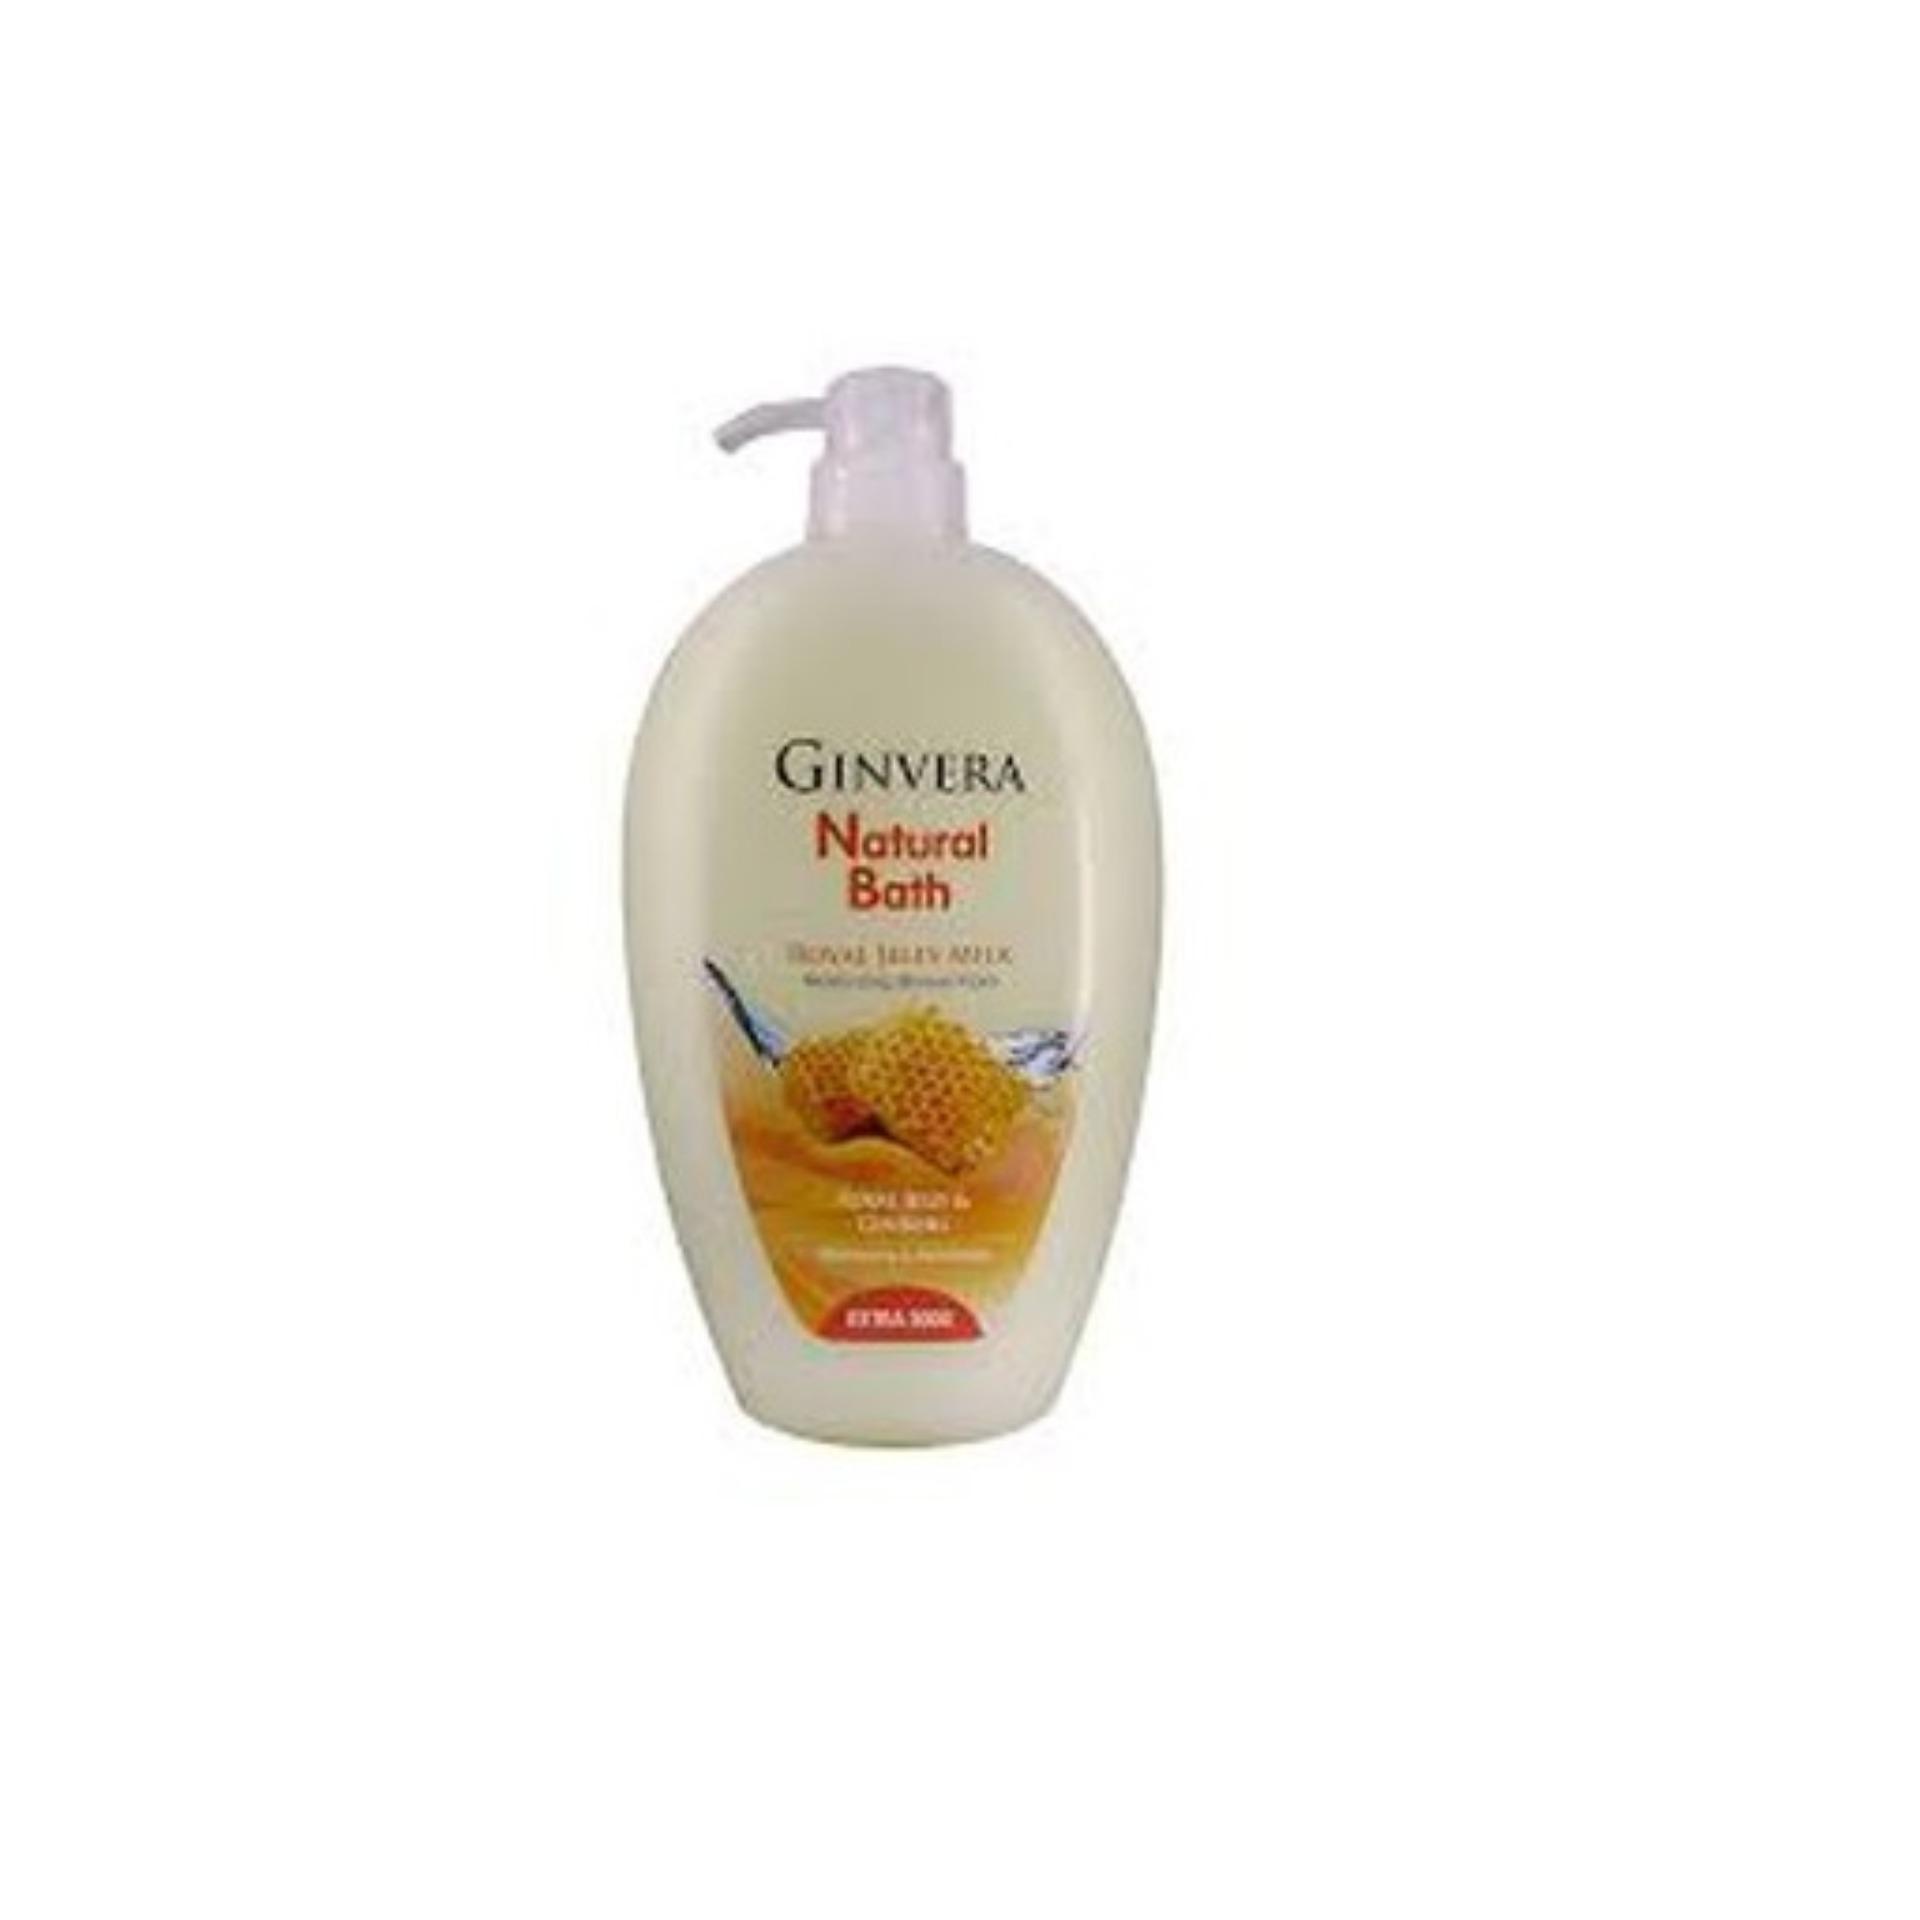 Ginvera Natural Bath Shower Gel 1000G Royal Jelly